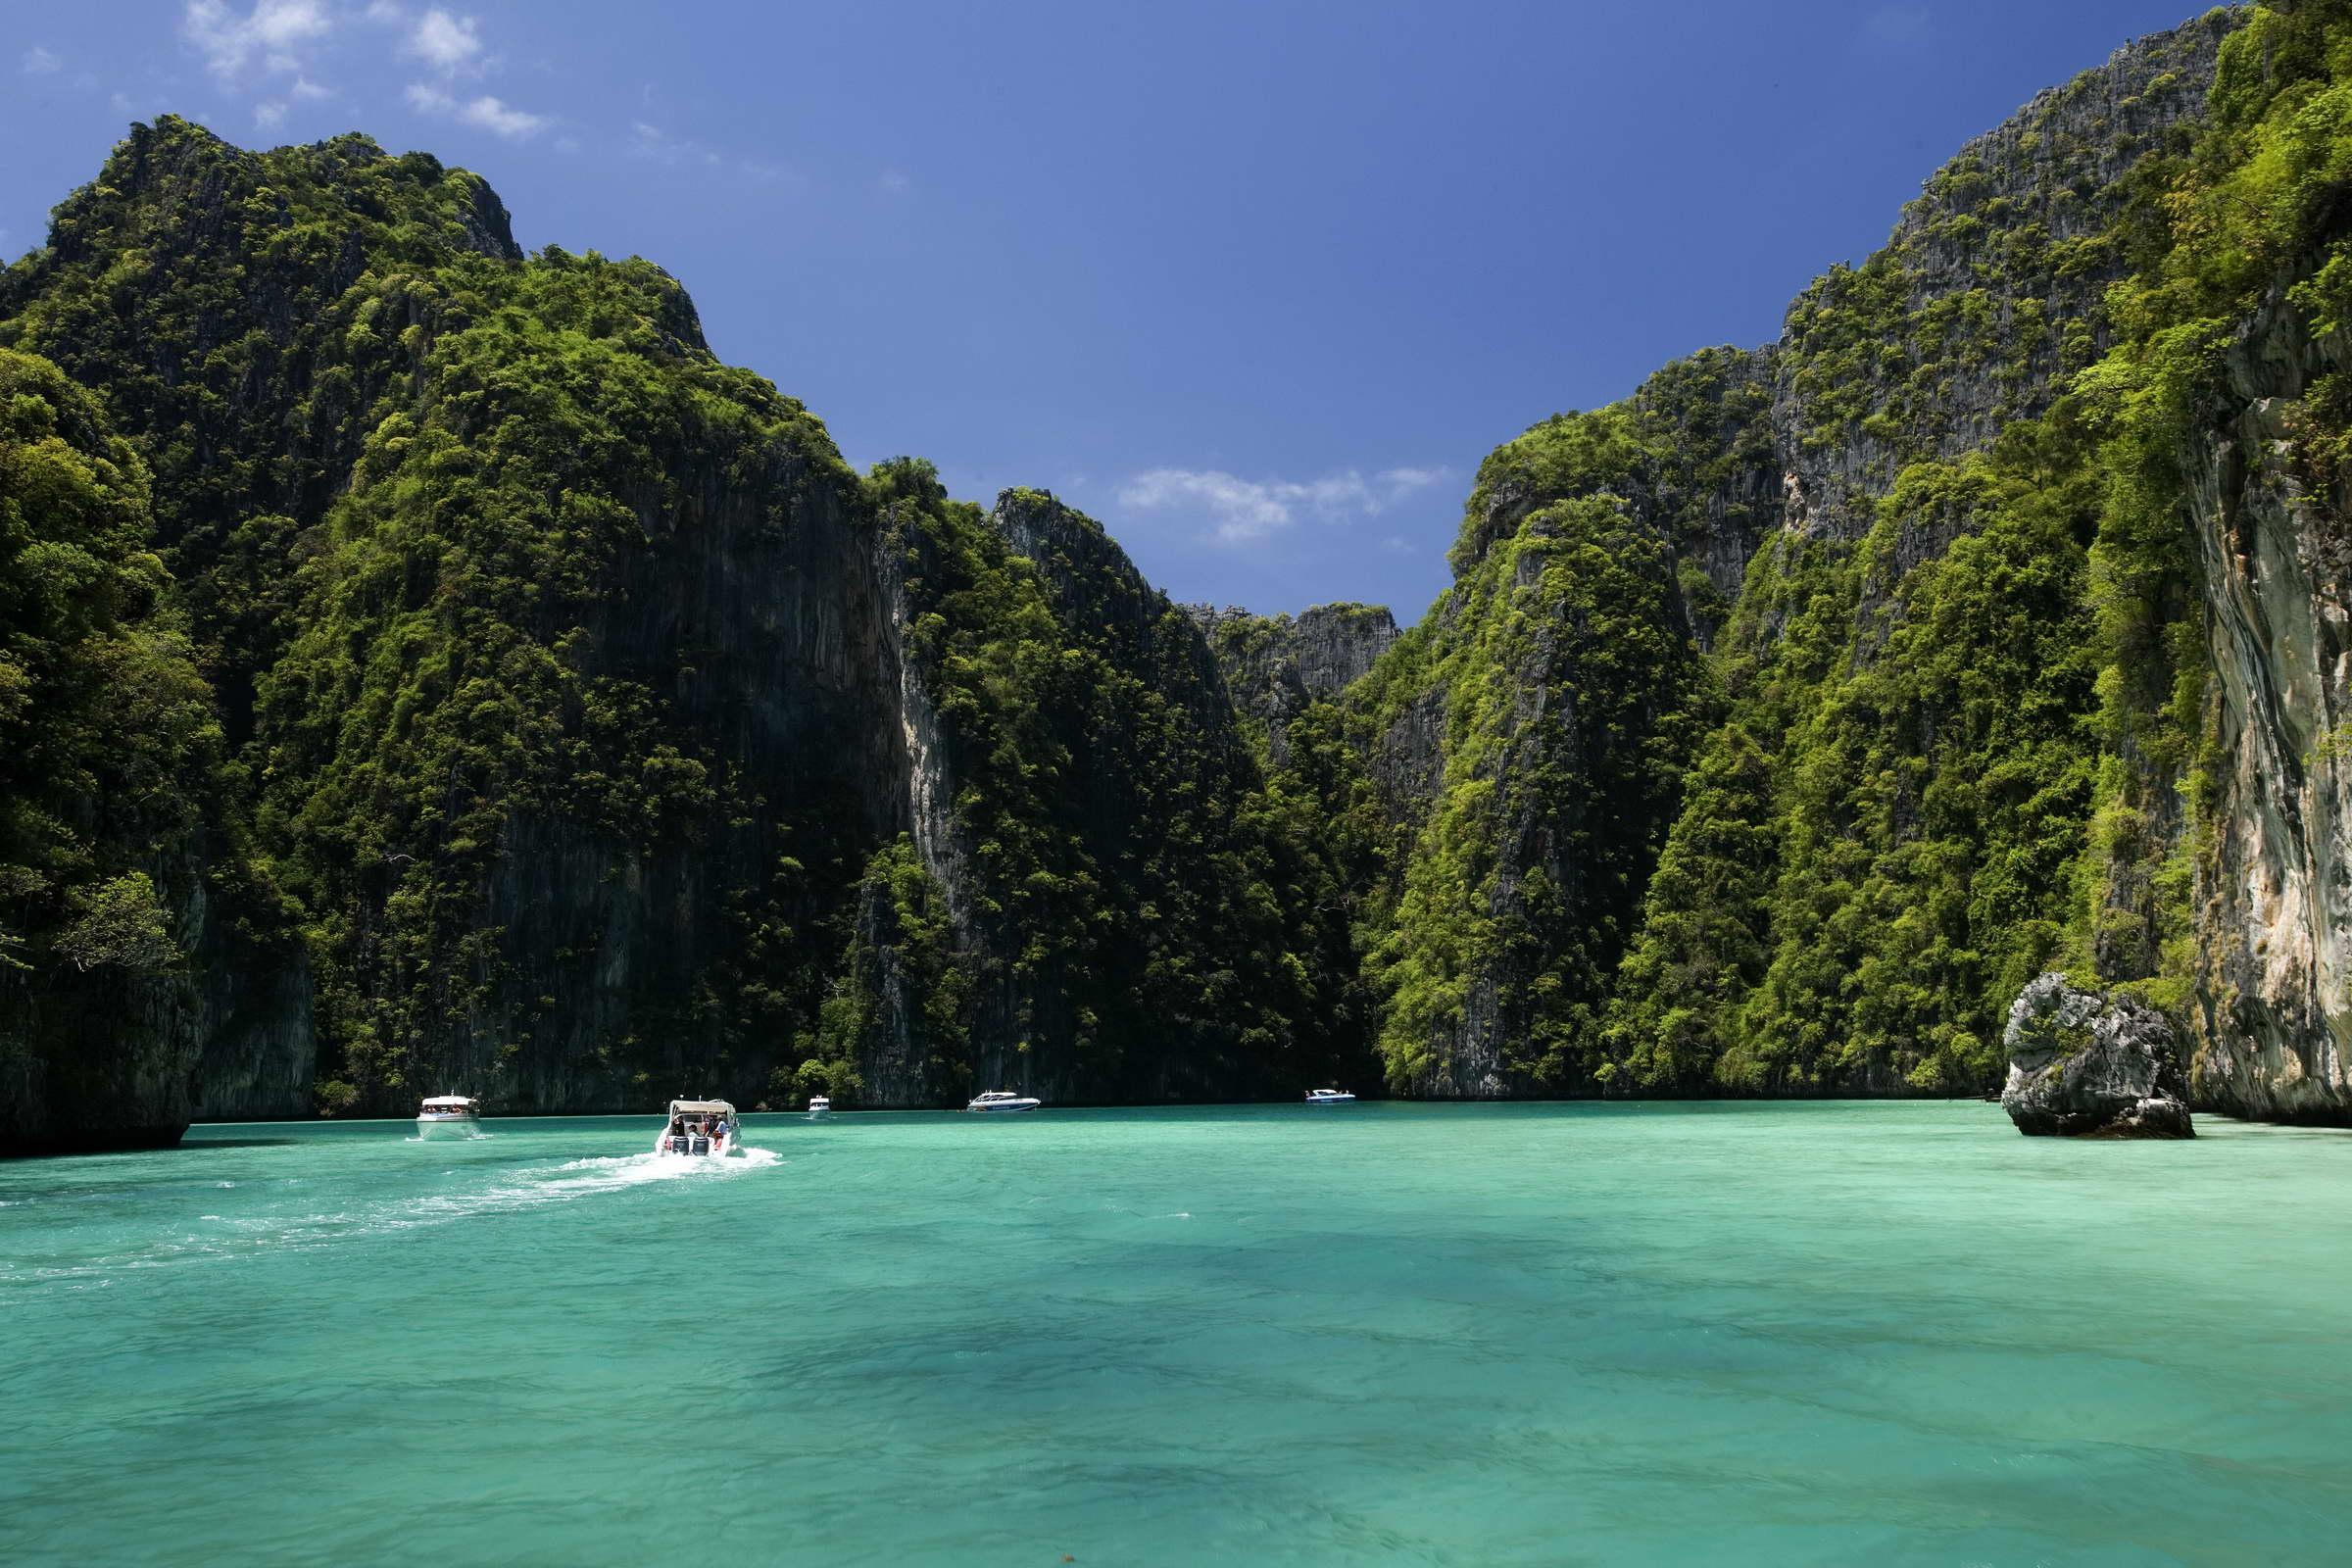 Pi Le Bay in Phi Phi Le Island, Hat Noppharat Thara - Mu Ko Phi Phi National Park, Krabi